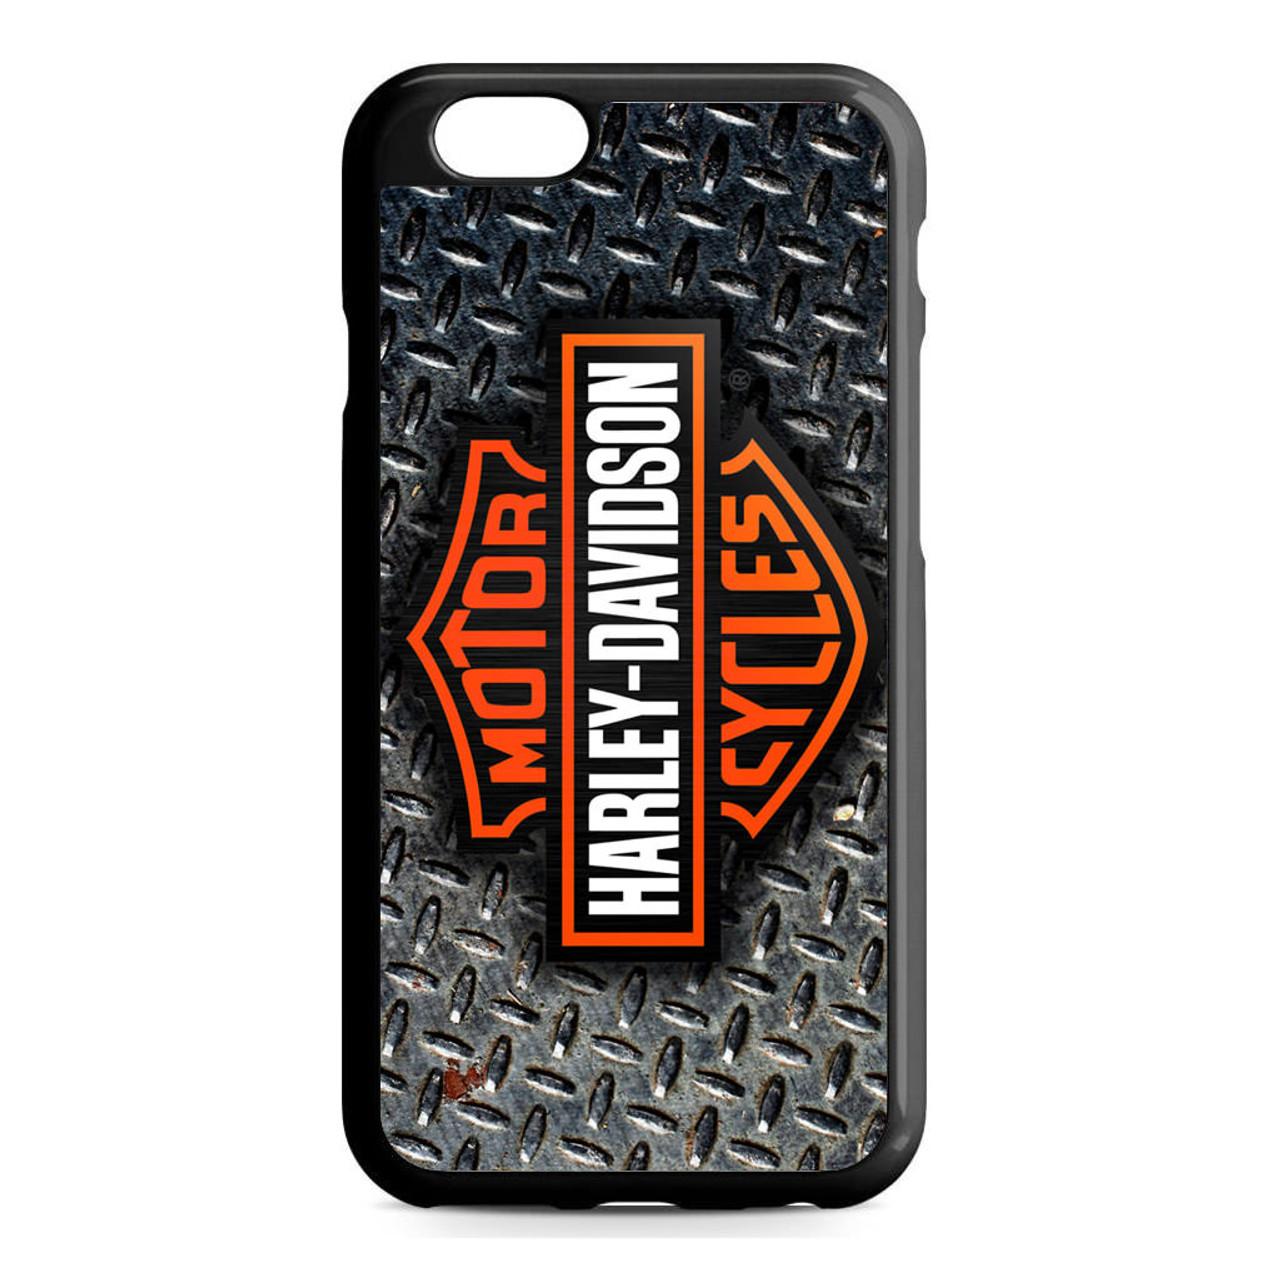 sports shoes d7c3a 54b52 Harley Davidson Logo Diamond Plate iPhone 6/6S Case